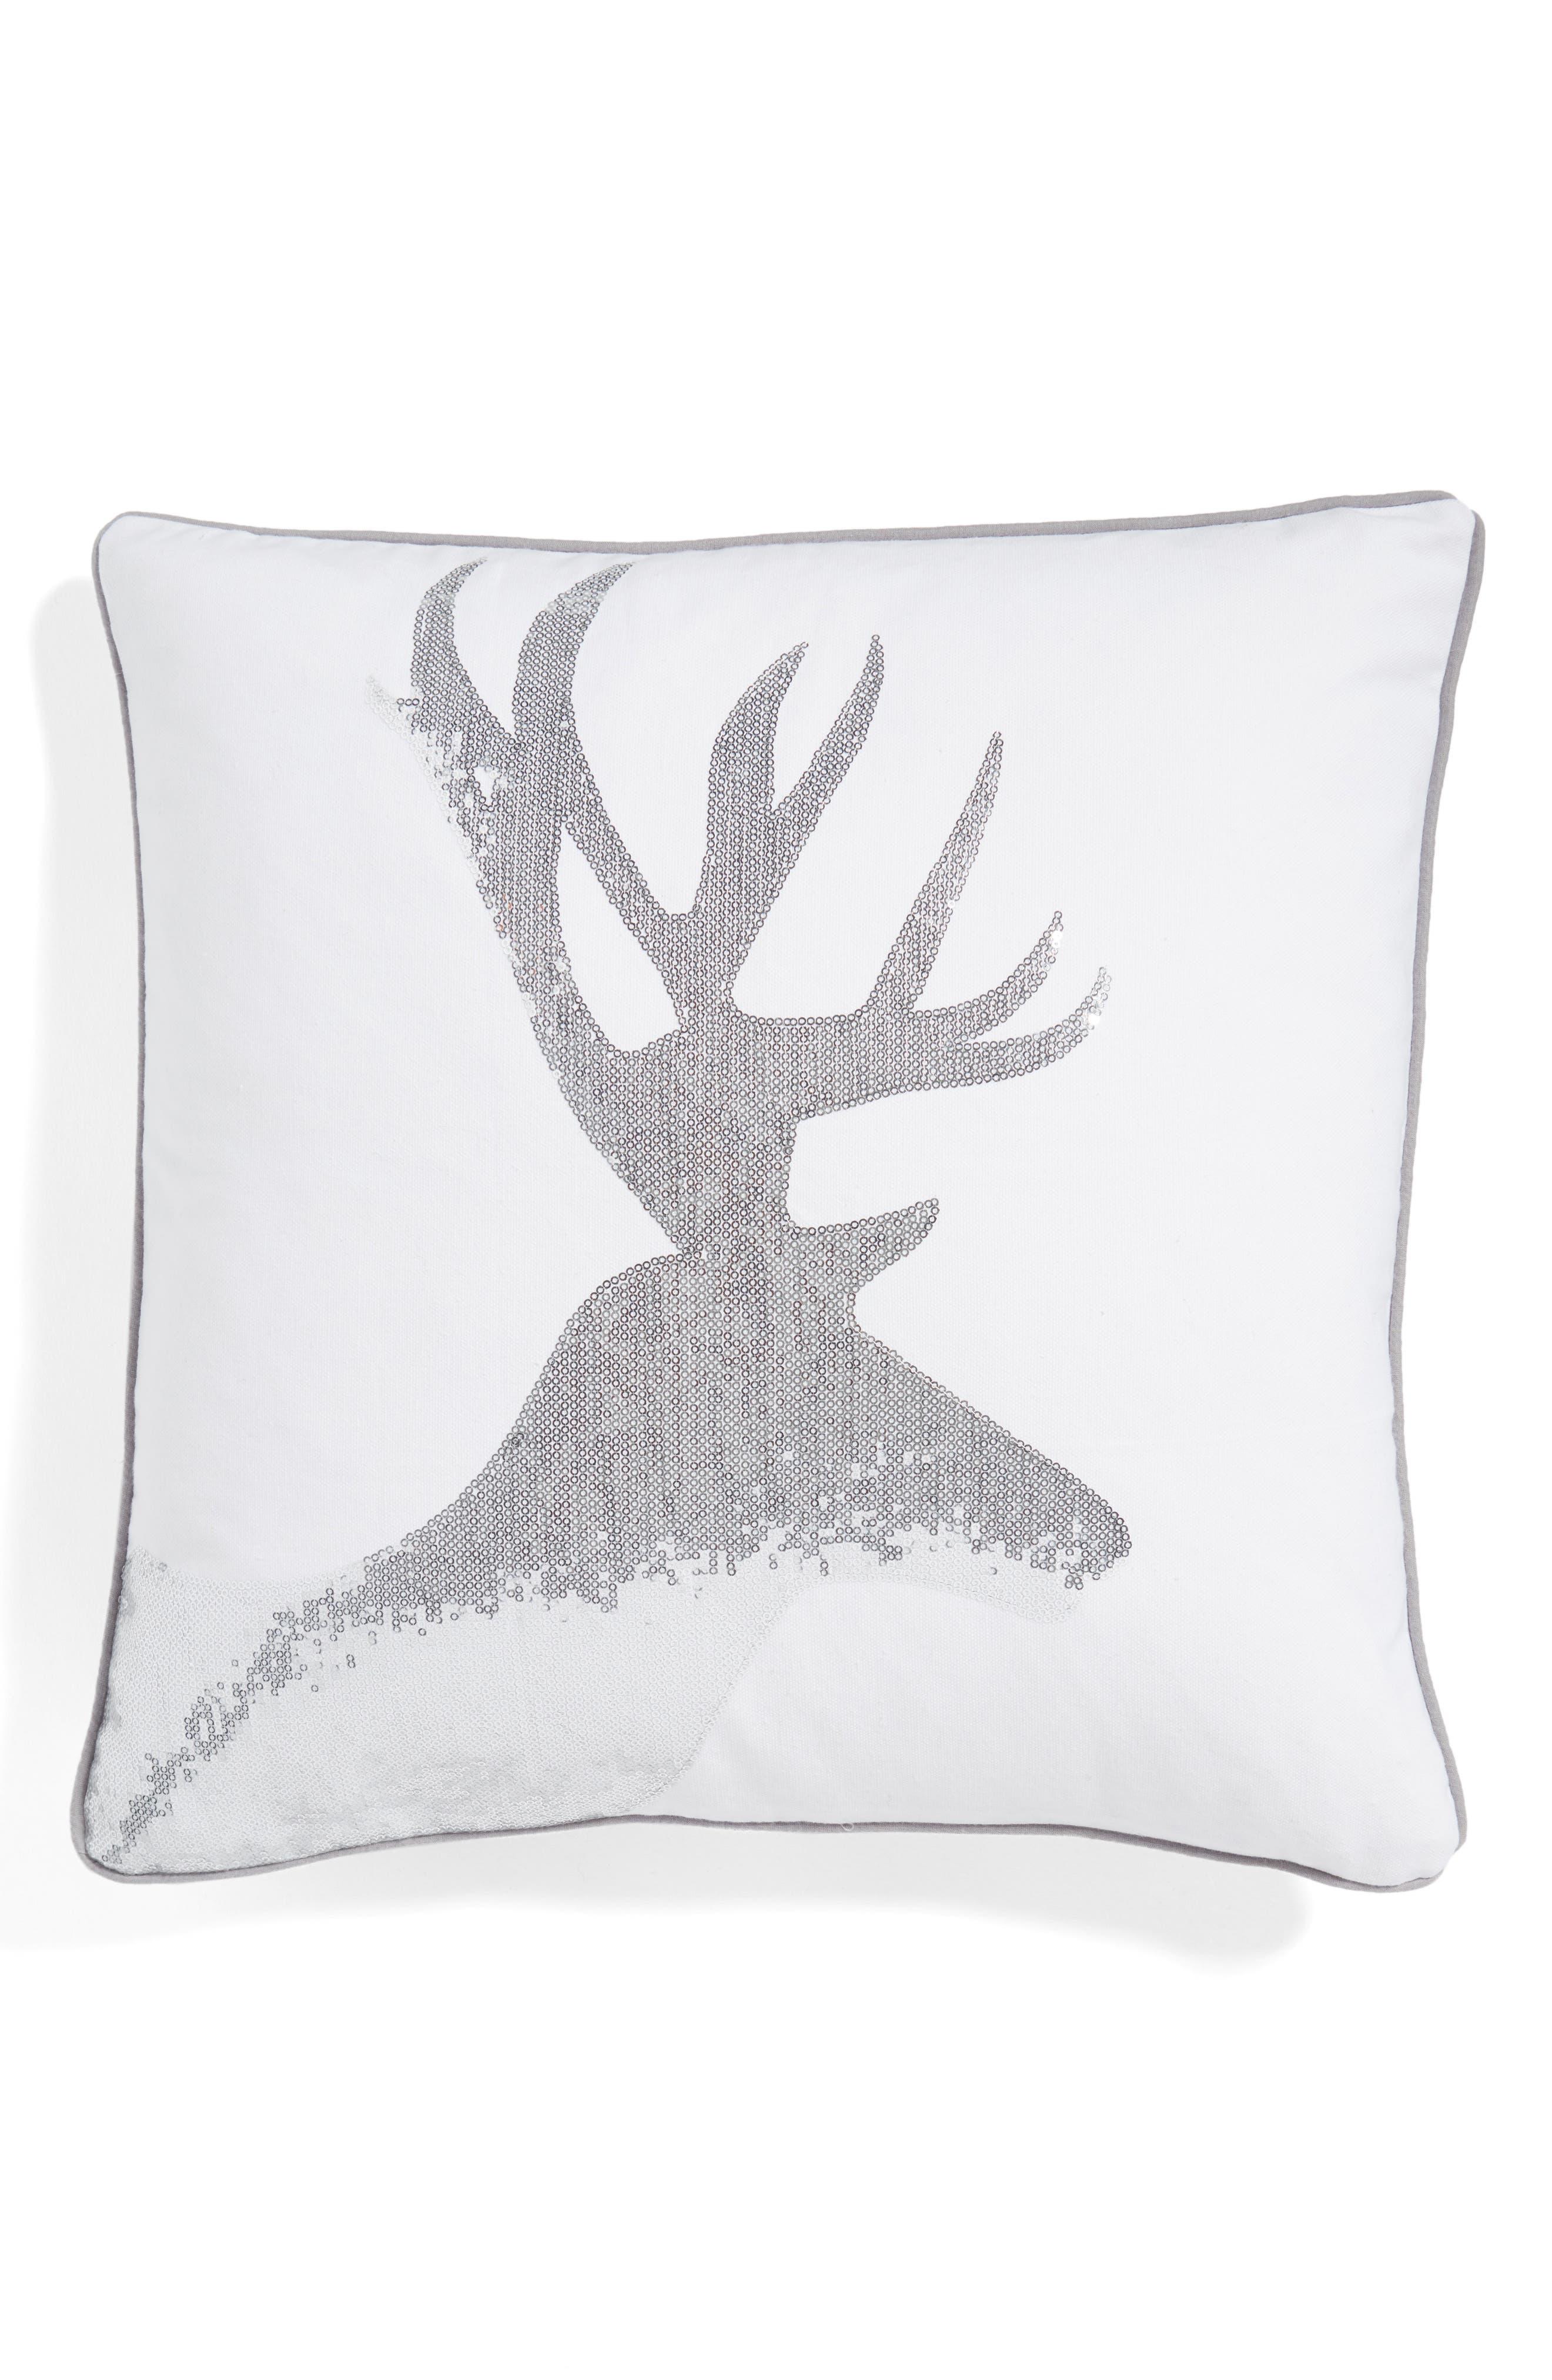 Alternate Image 1 Selected - Levtex Sequin Reindeer Pillow